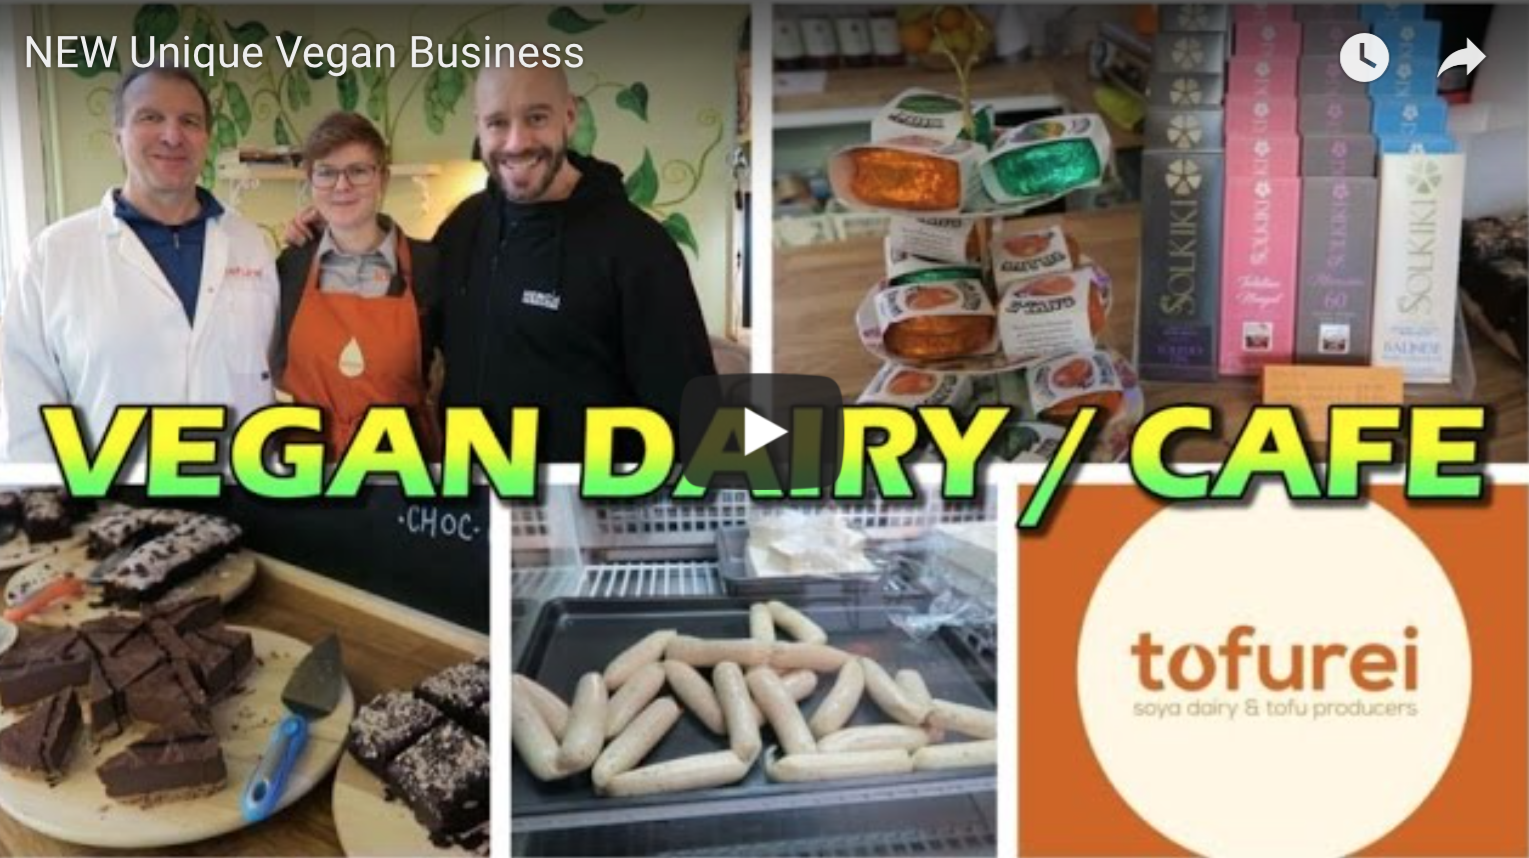 NEW Unique Vegan Business | VeganFlix